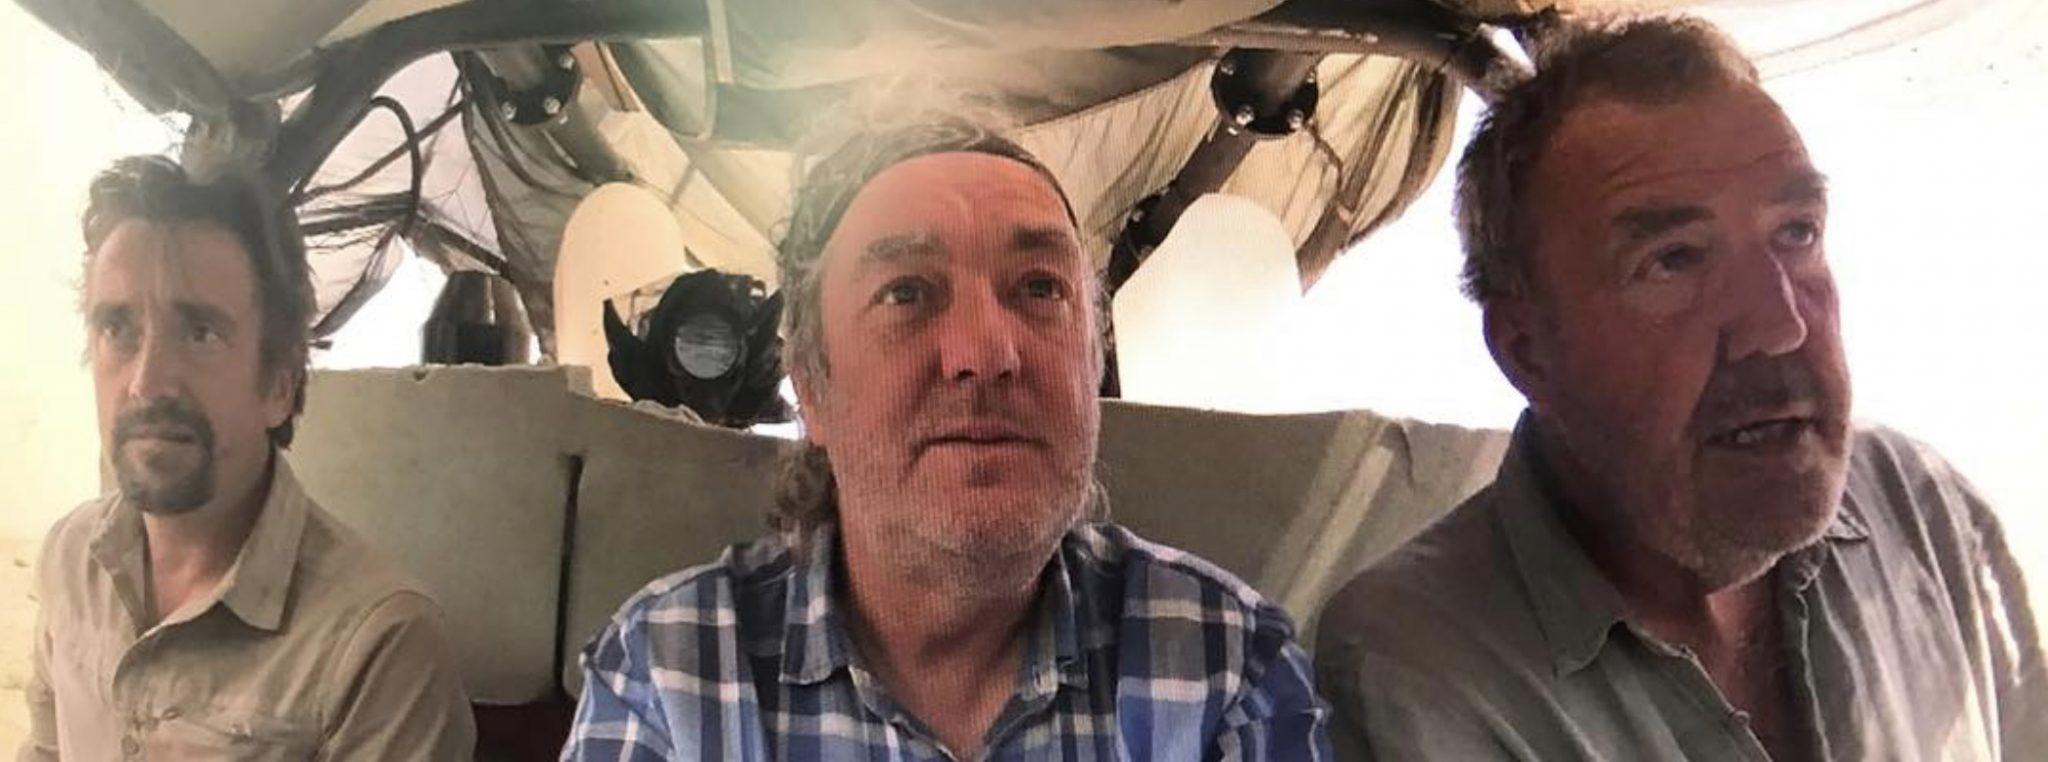 Richard Hammond, James May, Jeremy Clarkson, The Grand Tour, Amazon-https://www.instagram.com/p/Bq8JThWFNN7/